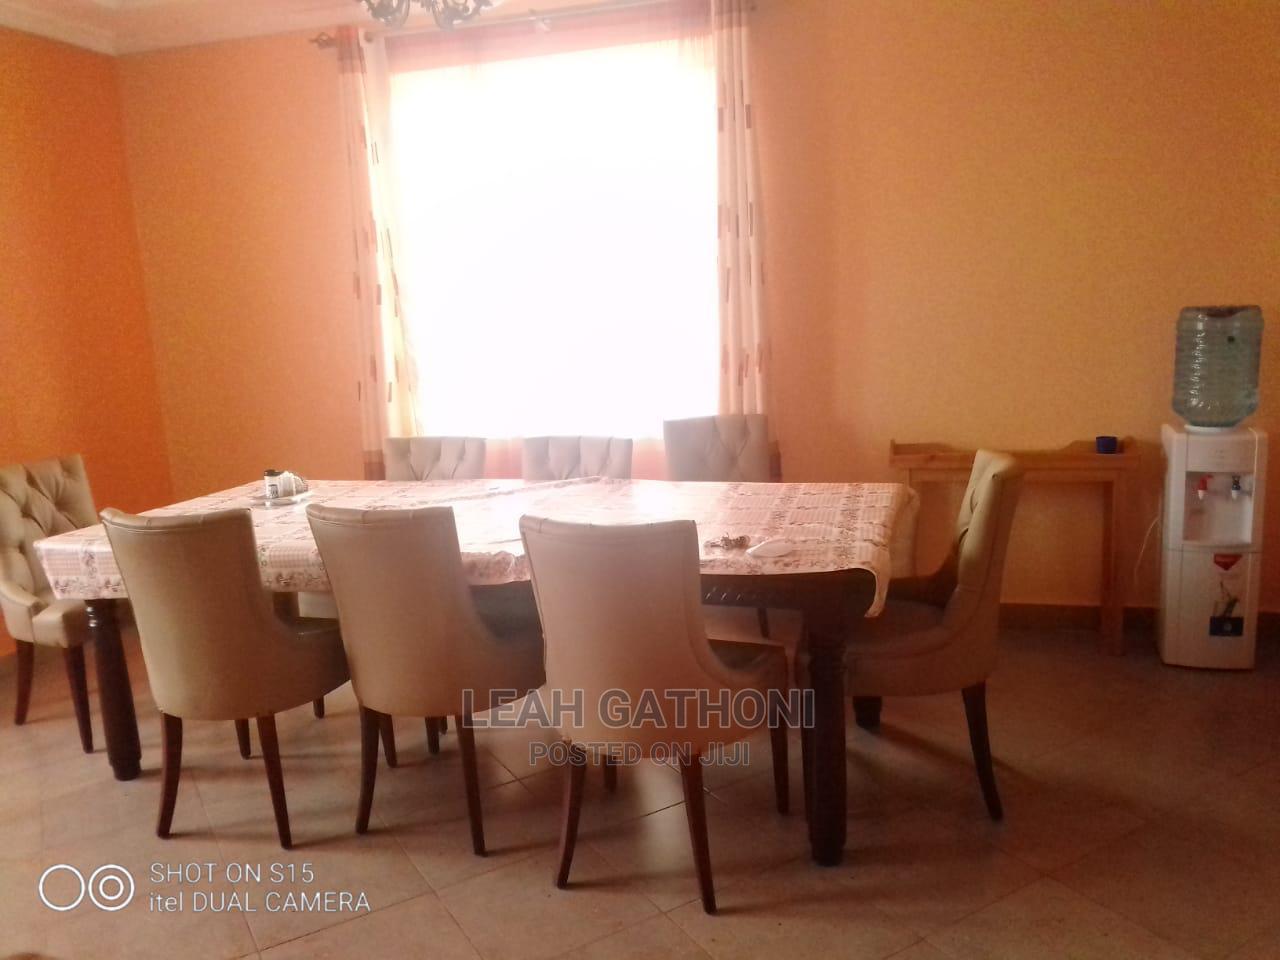 4 Bedrooms Bungalow for Sale in Landless, Thika | Houses & Apartments For Sale for sale in Thika, Kiambu, Kenya